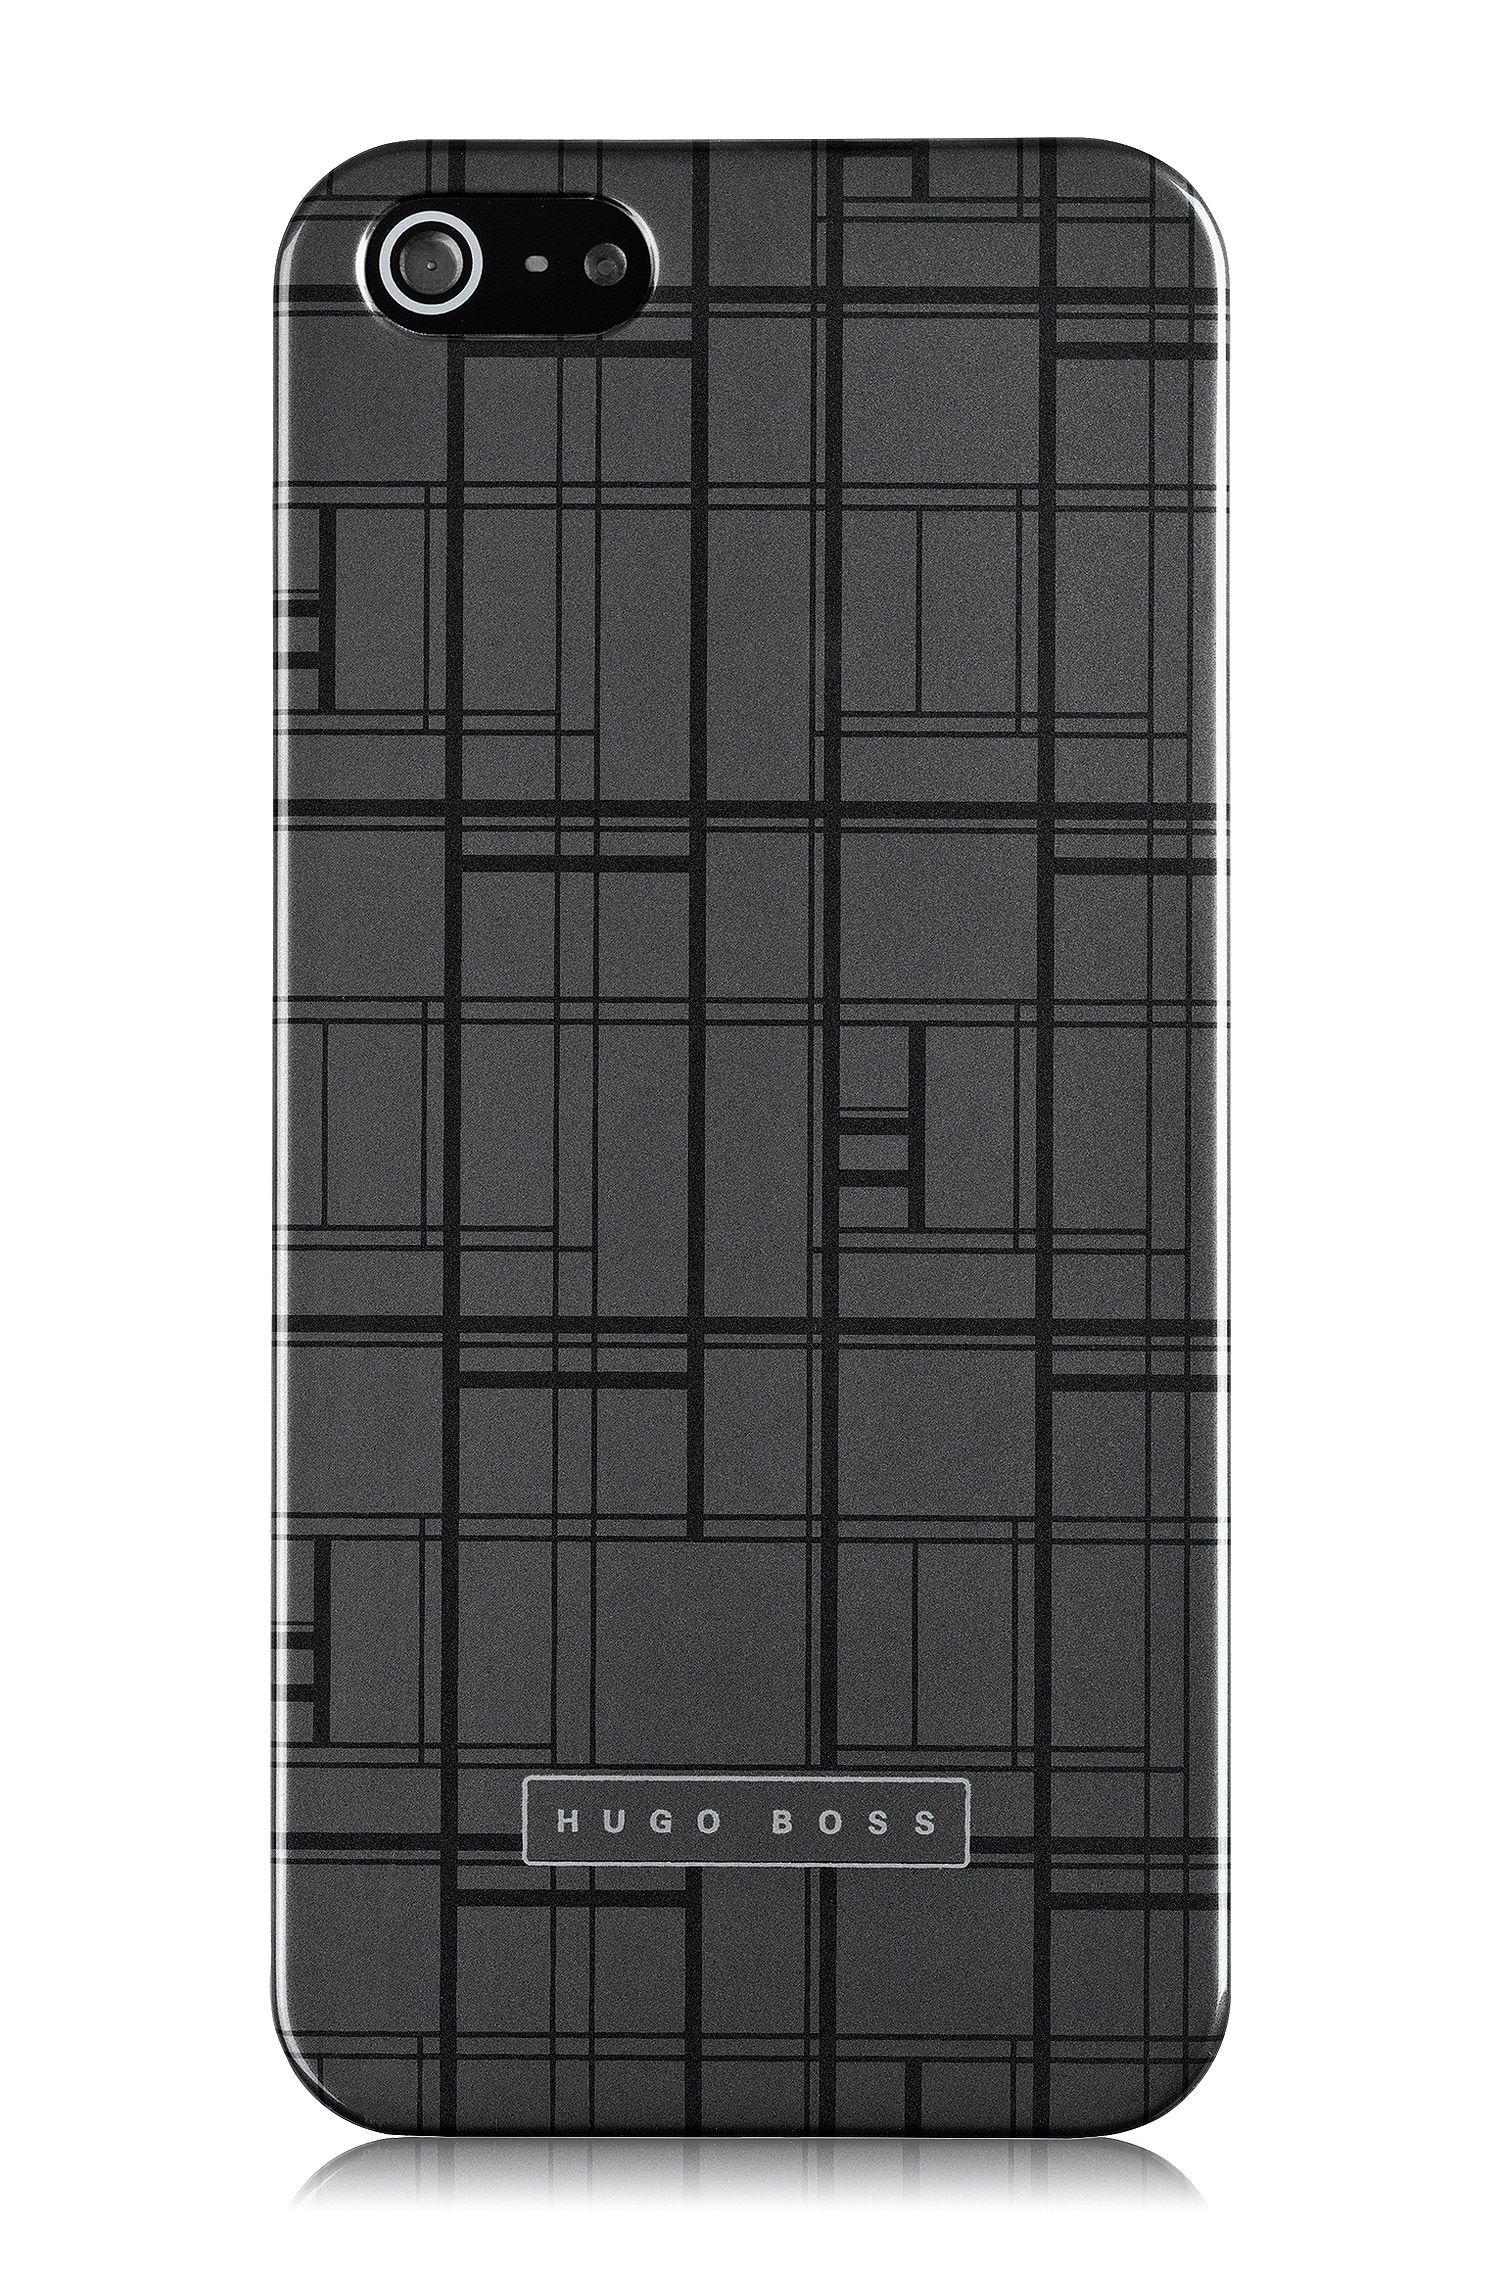 'Catwalk IP5 Grey' | Scratch Resistant iPhone 5 Case , Dark Grey